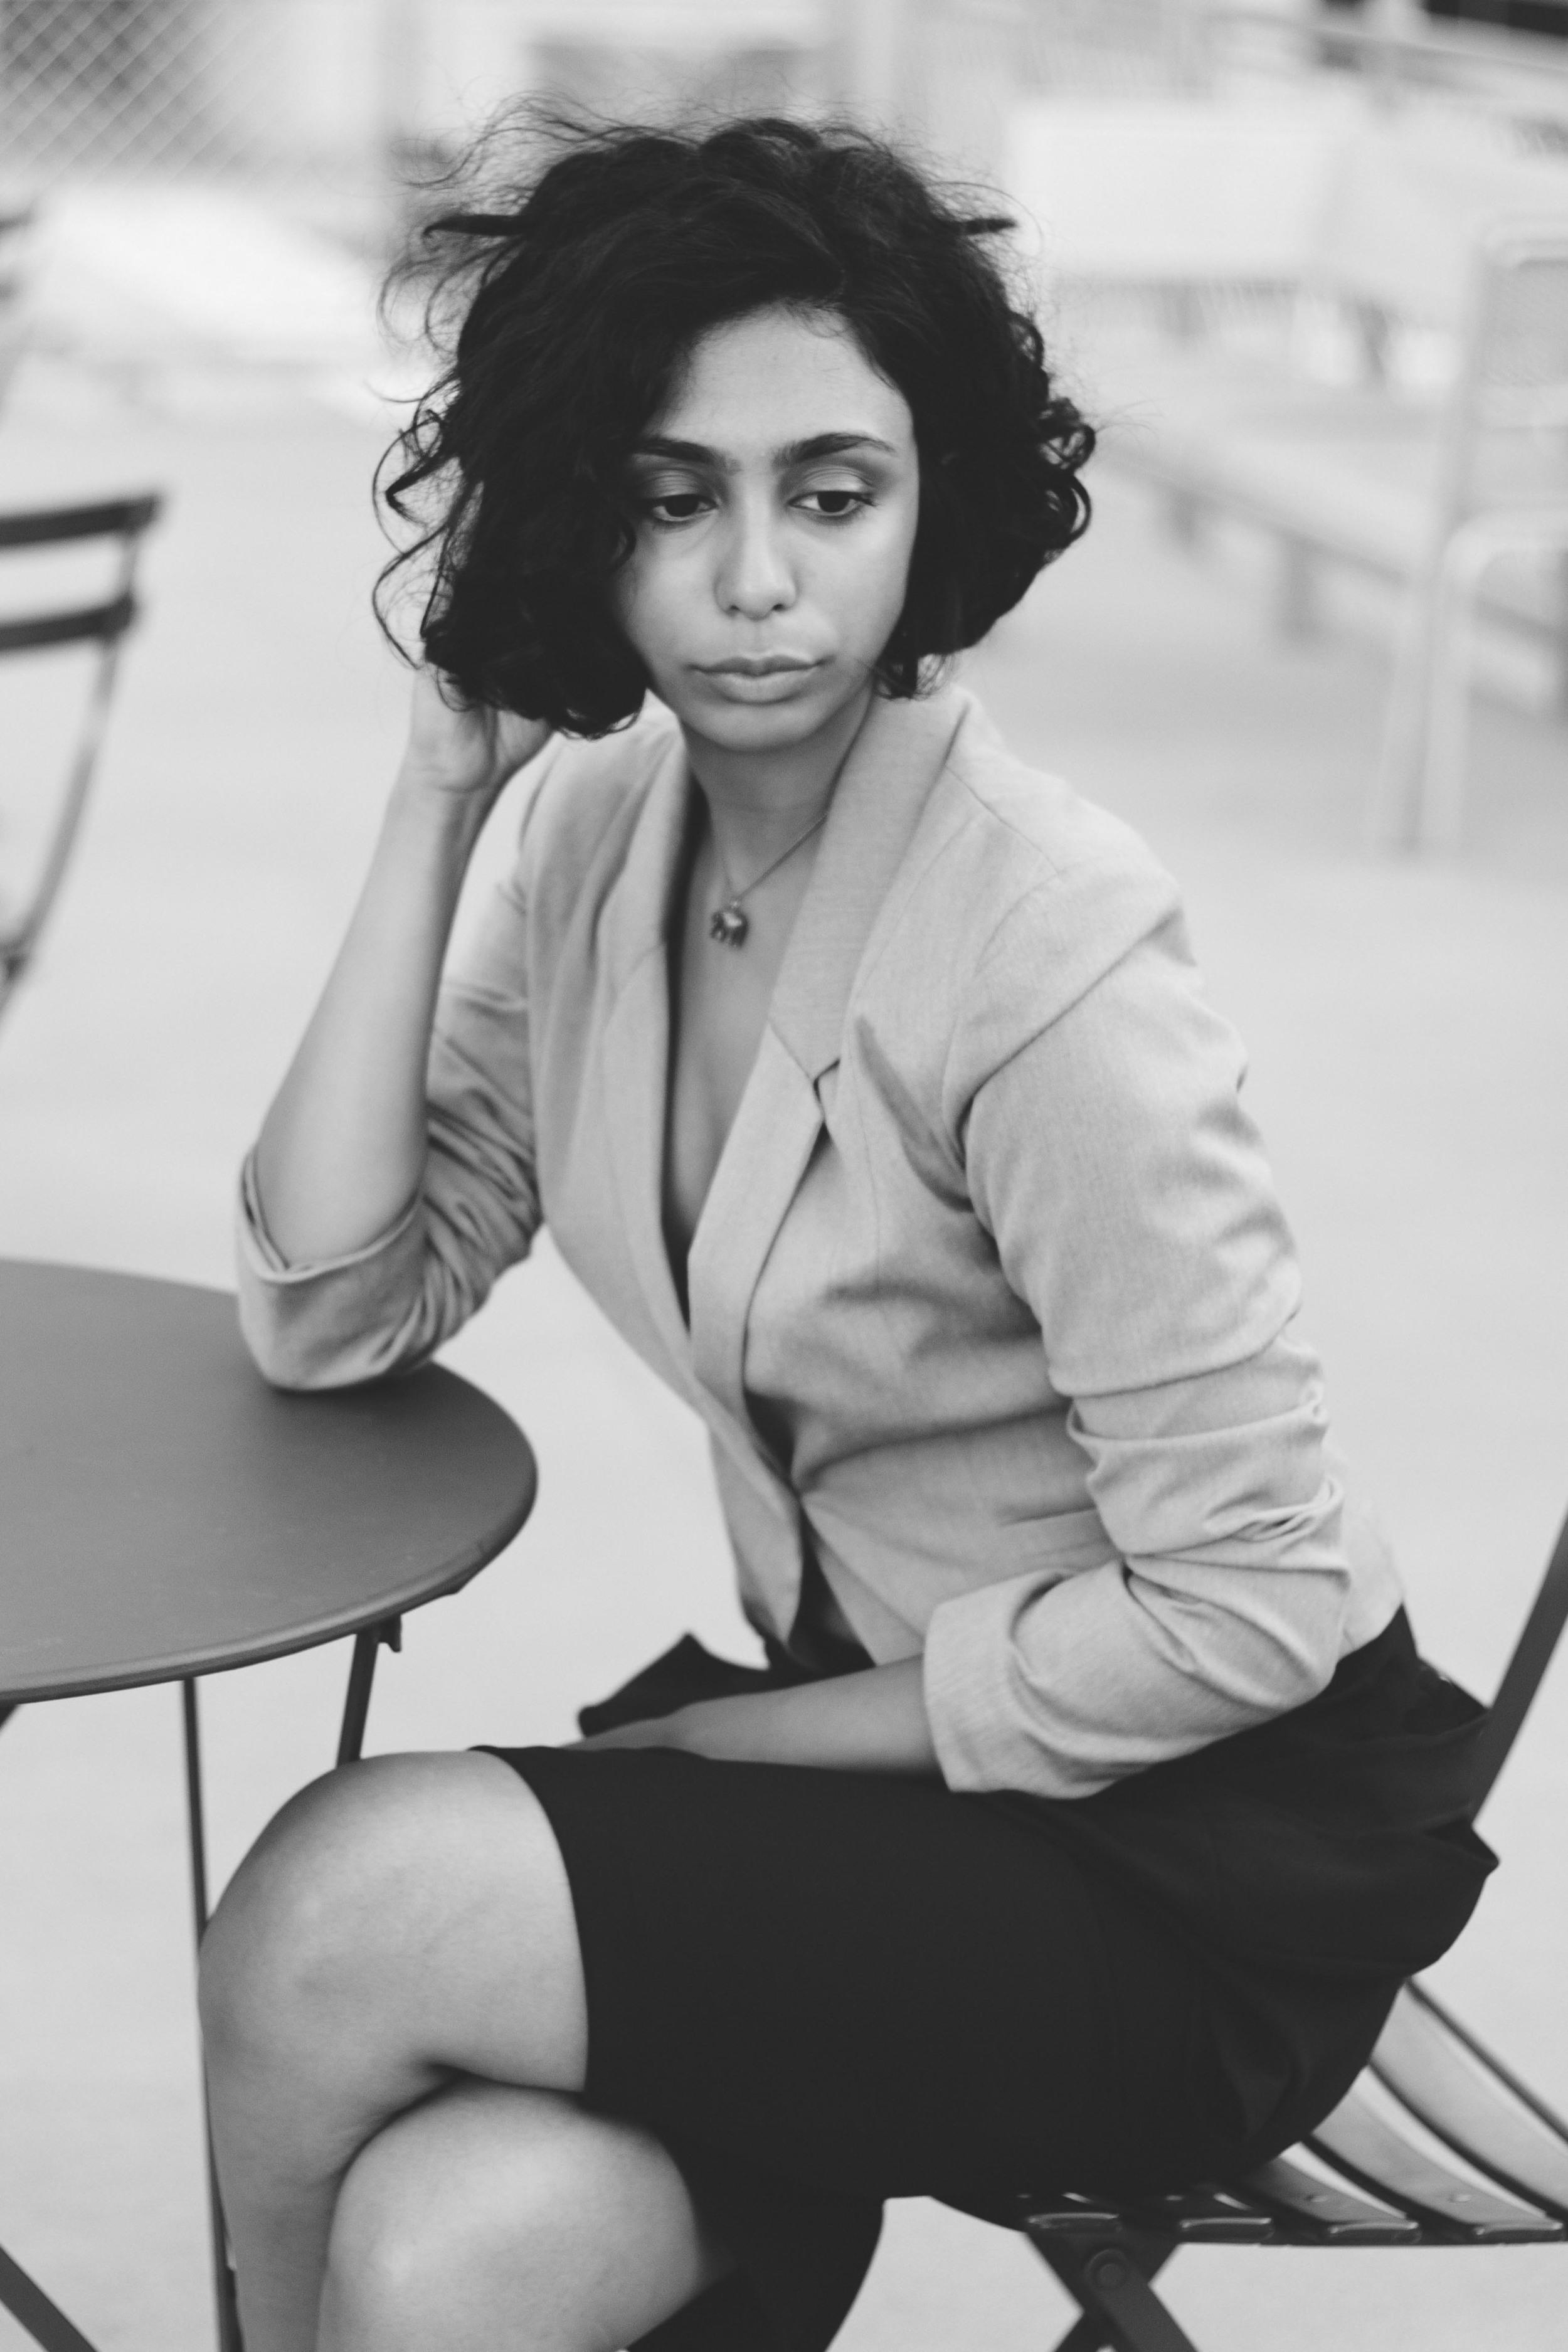 lincoln center portrait photography shooting model black and white irra korrelak walksmilesnap muriha qidwai.jpg